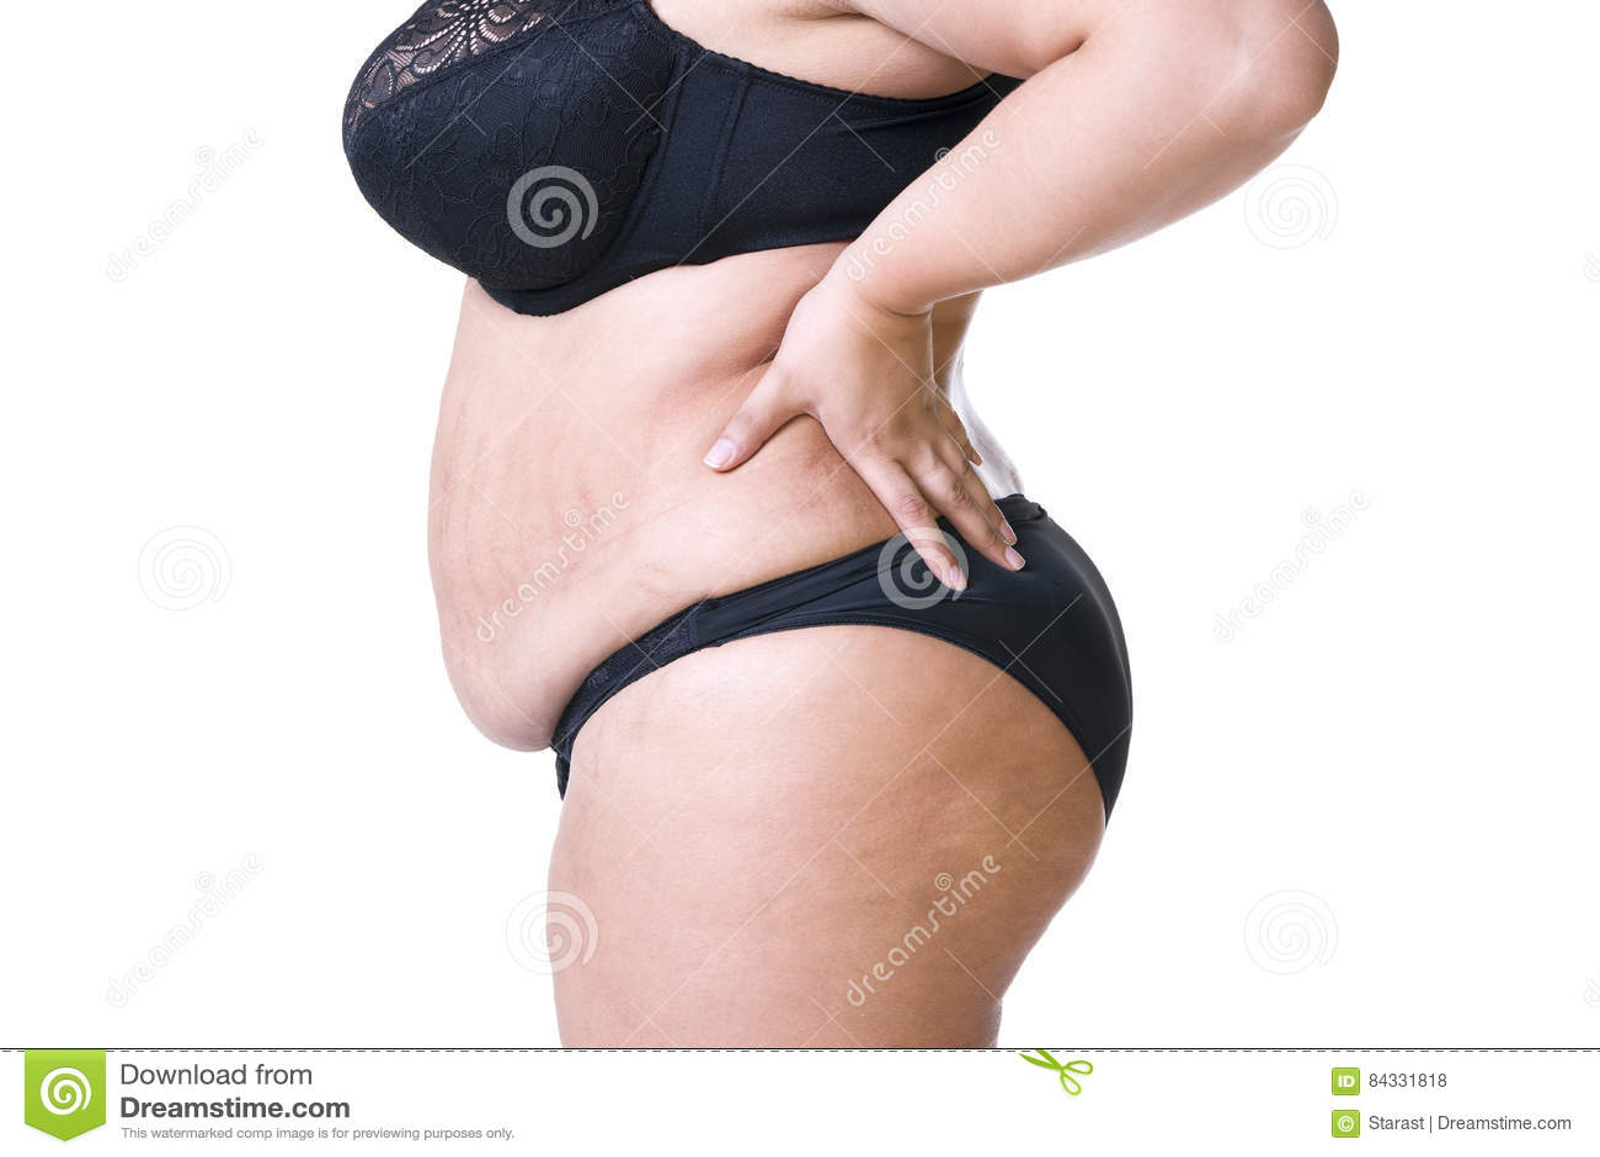 Www γυμνό σέξι pic